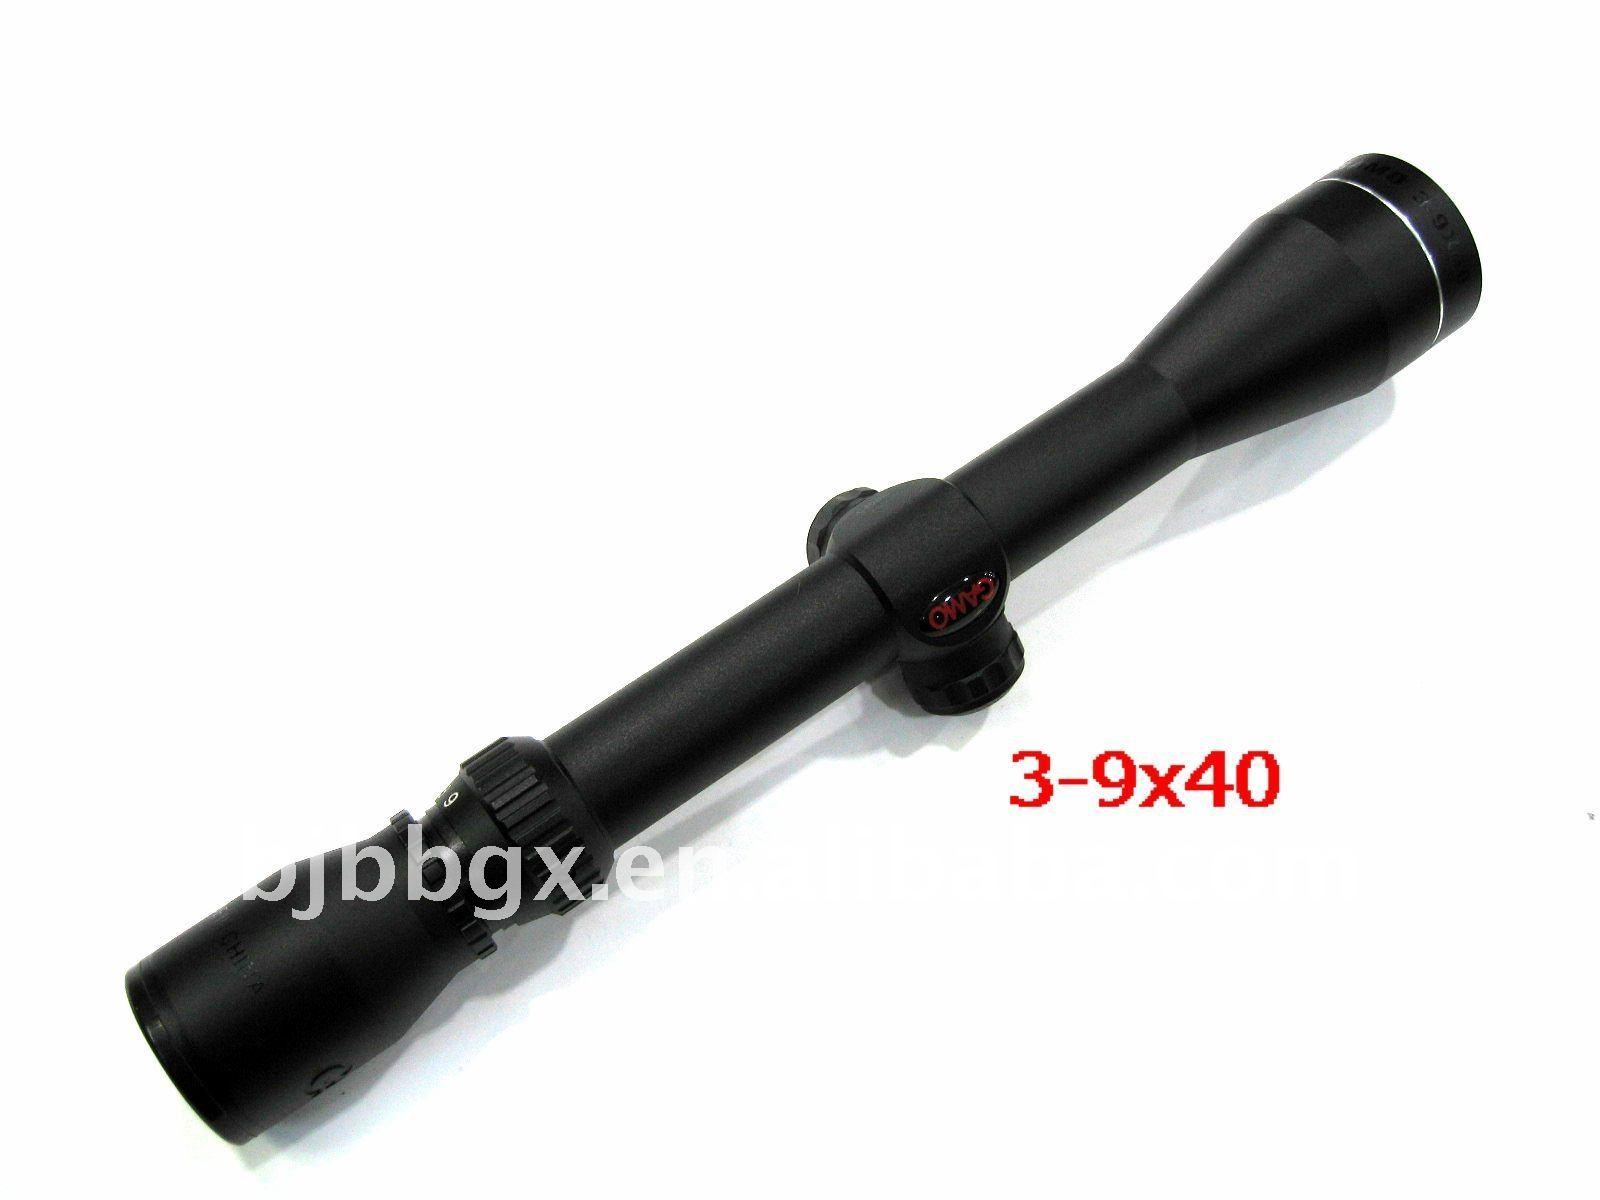 GAMO 3-9X40 riflescope rifle scope for airsoft